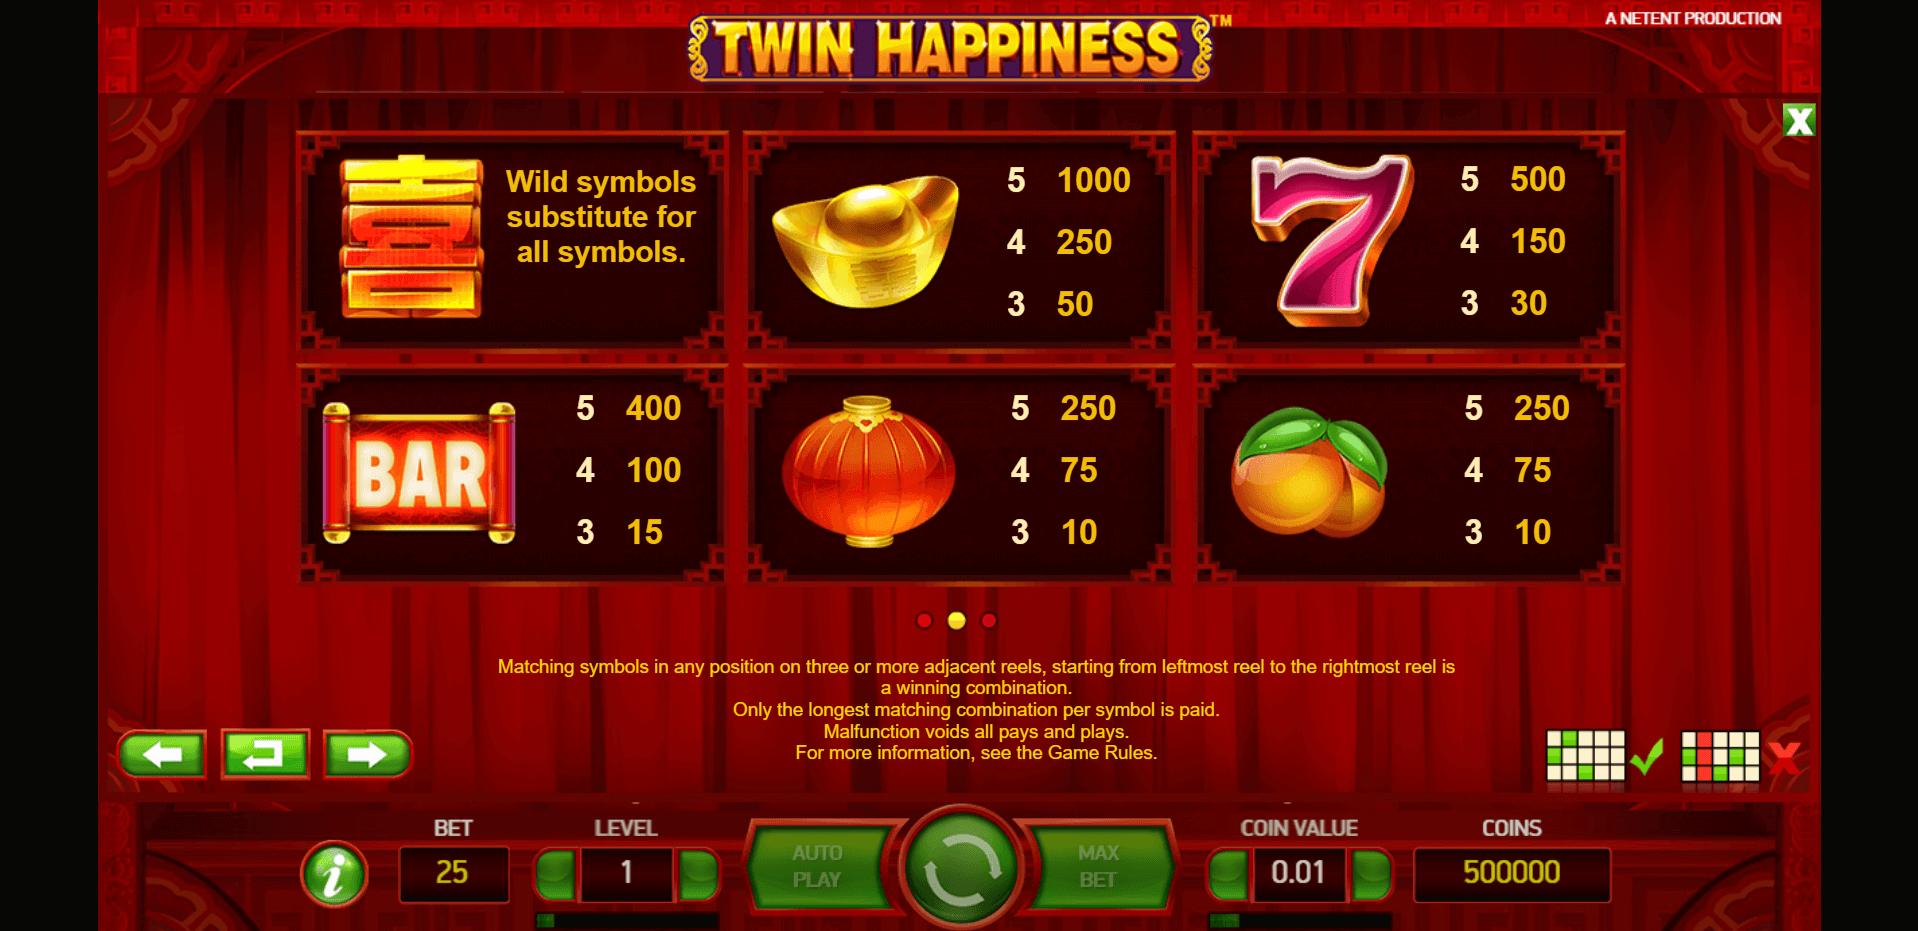 Nhl gambling sites